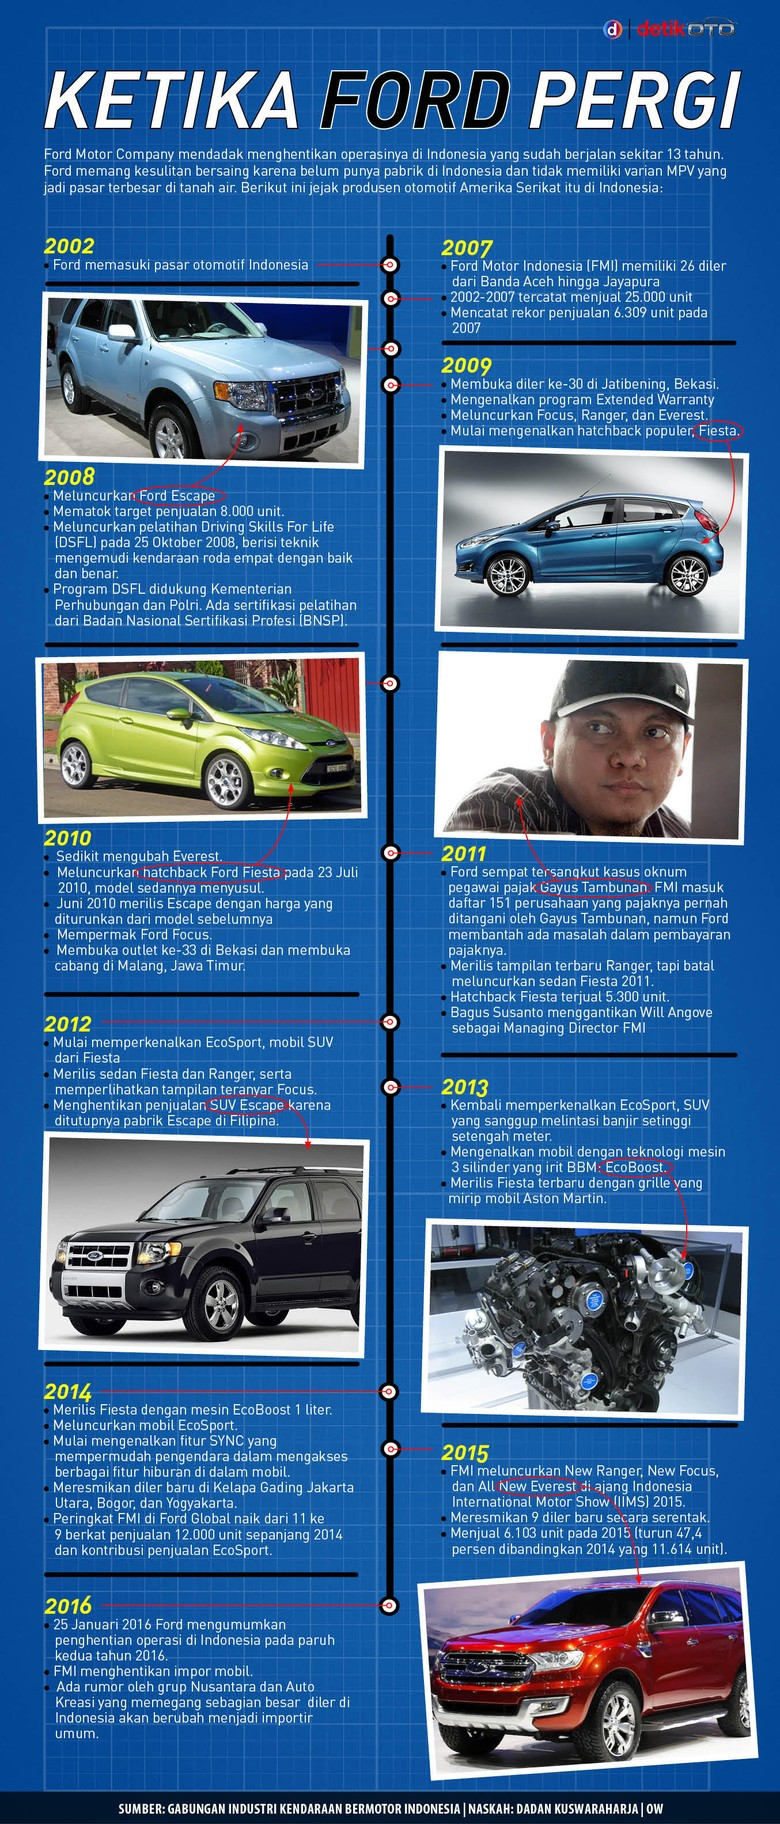 Ketika Ford Pergi